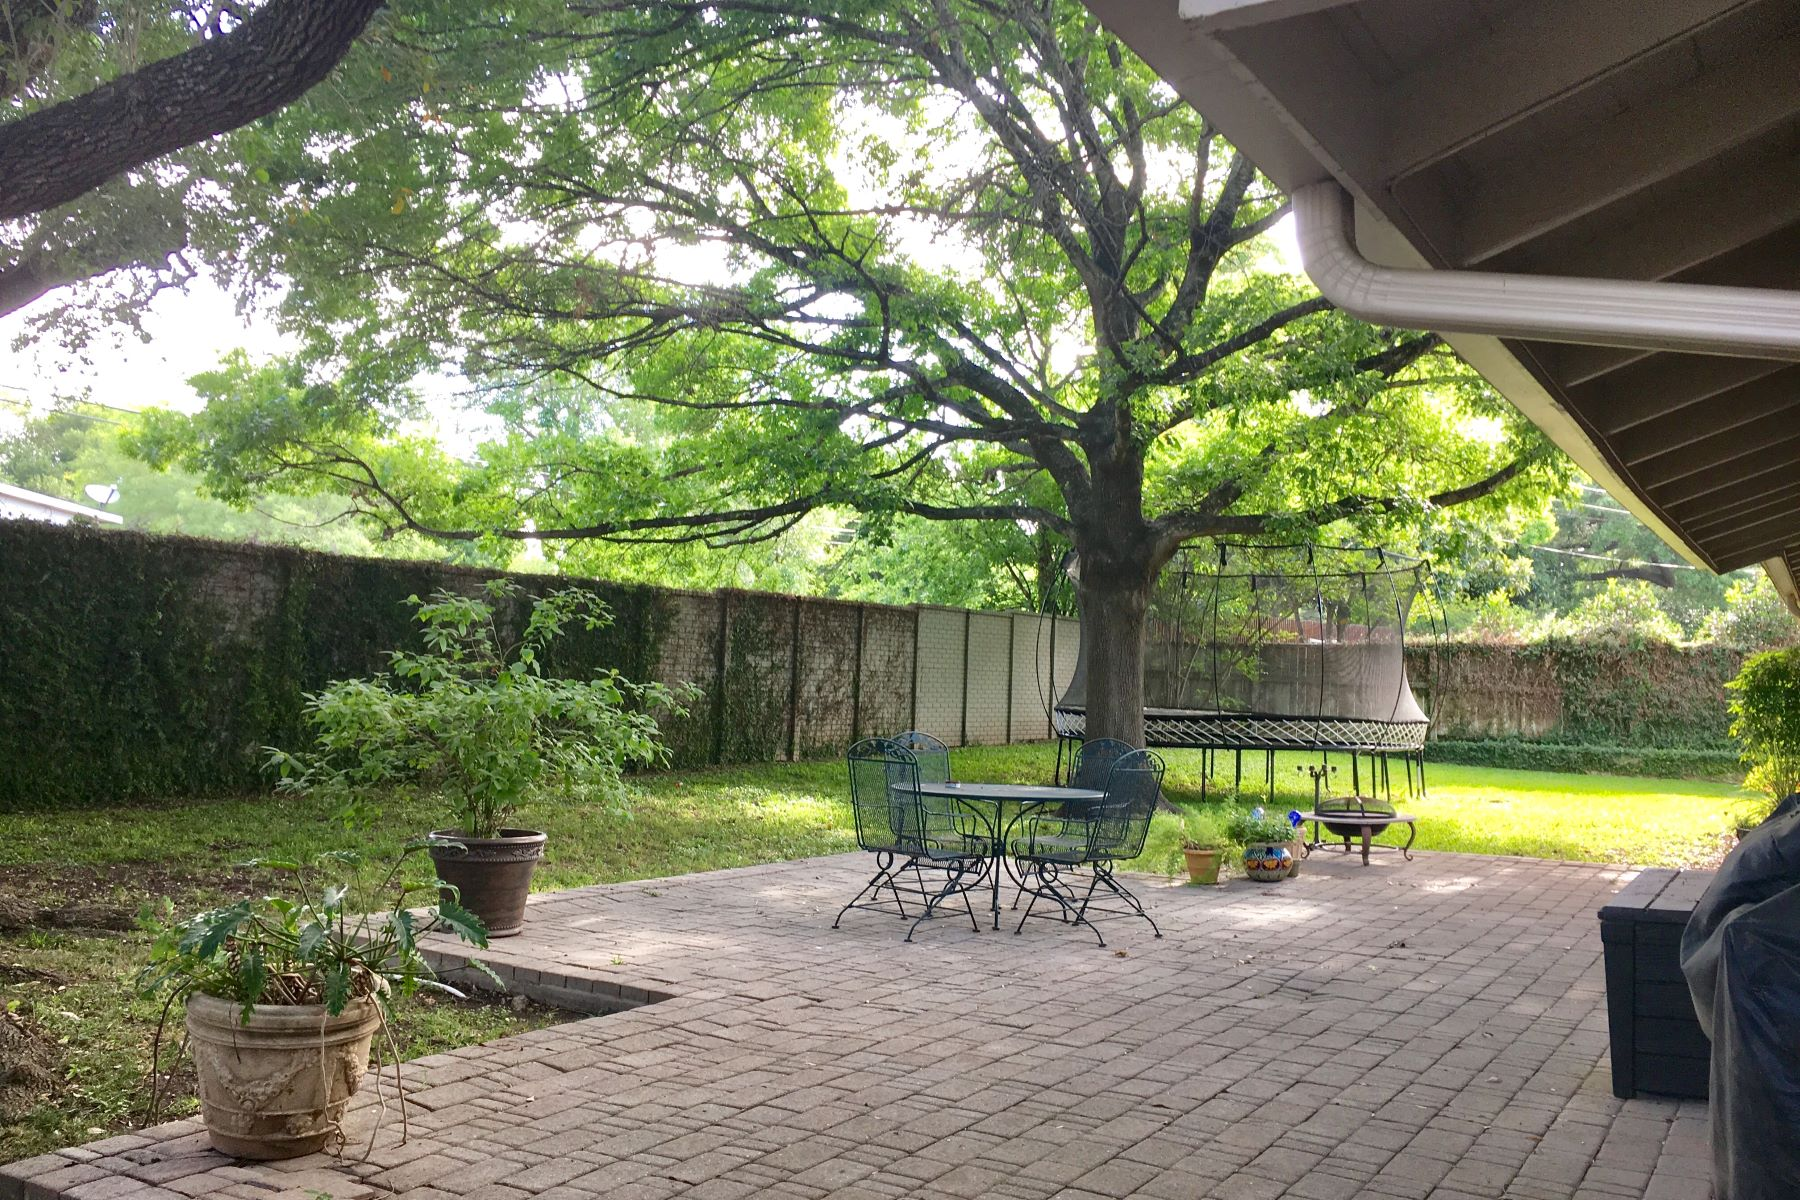 Additional photo for property listing at 2303 Briarwood 2303 Briarwood San Antonio, Texas 78209 United States